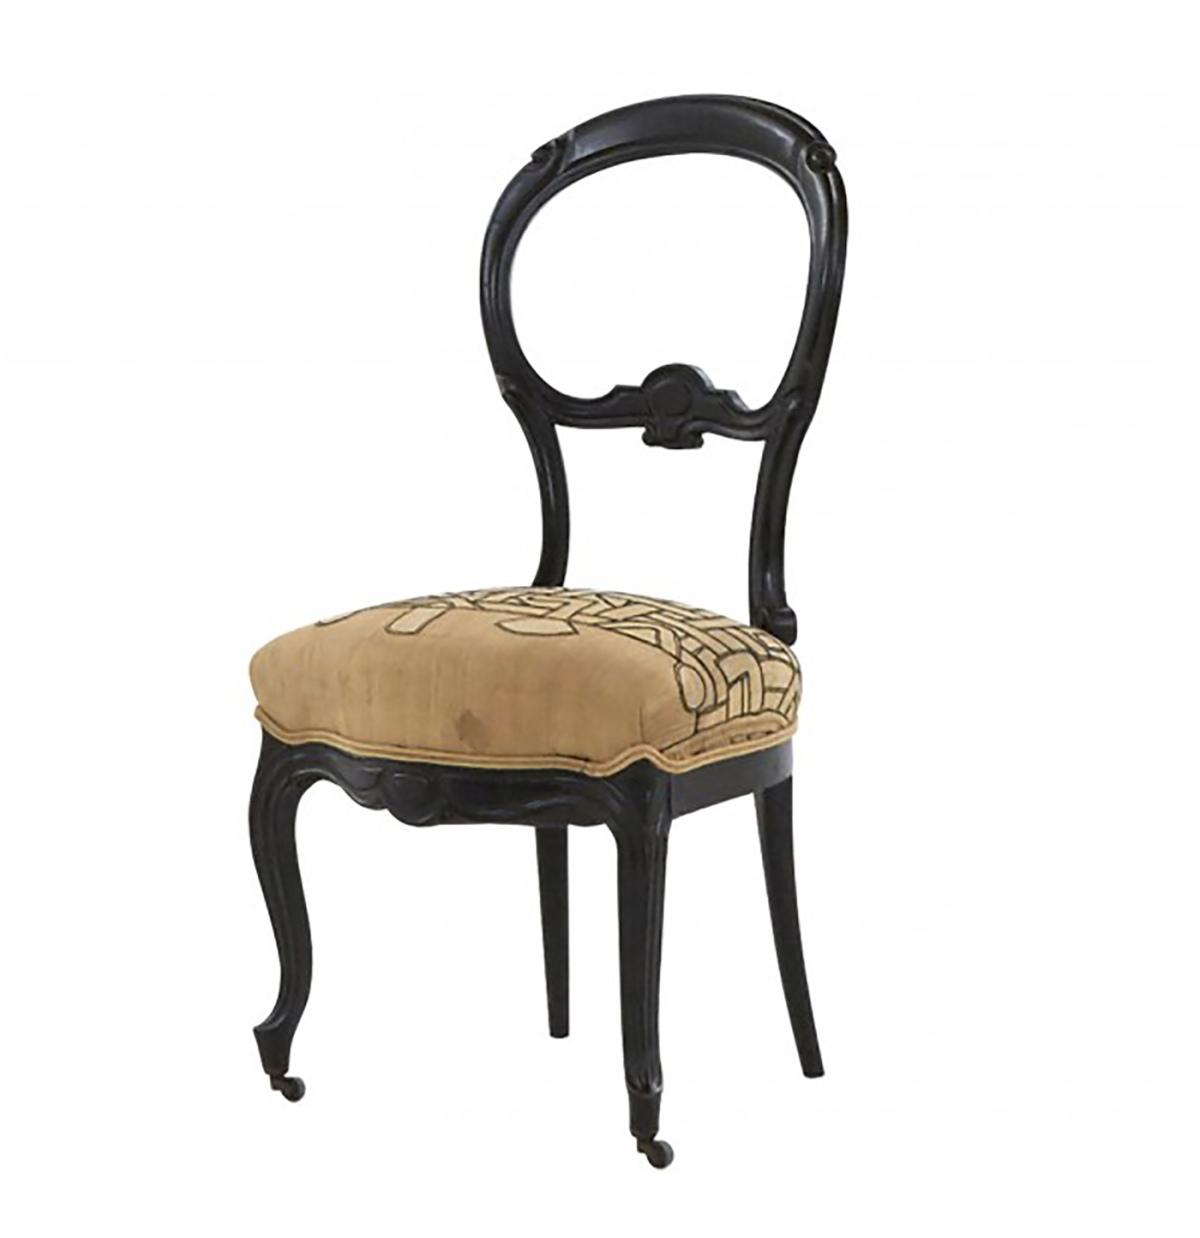 jayson vintage dining chair.jpg